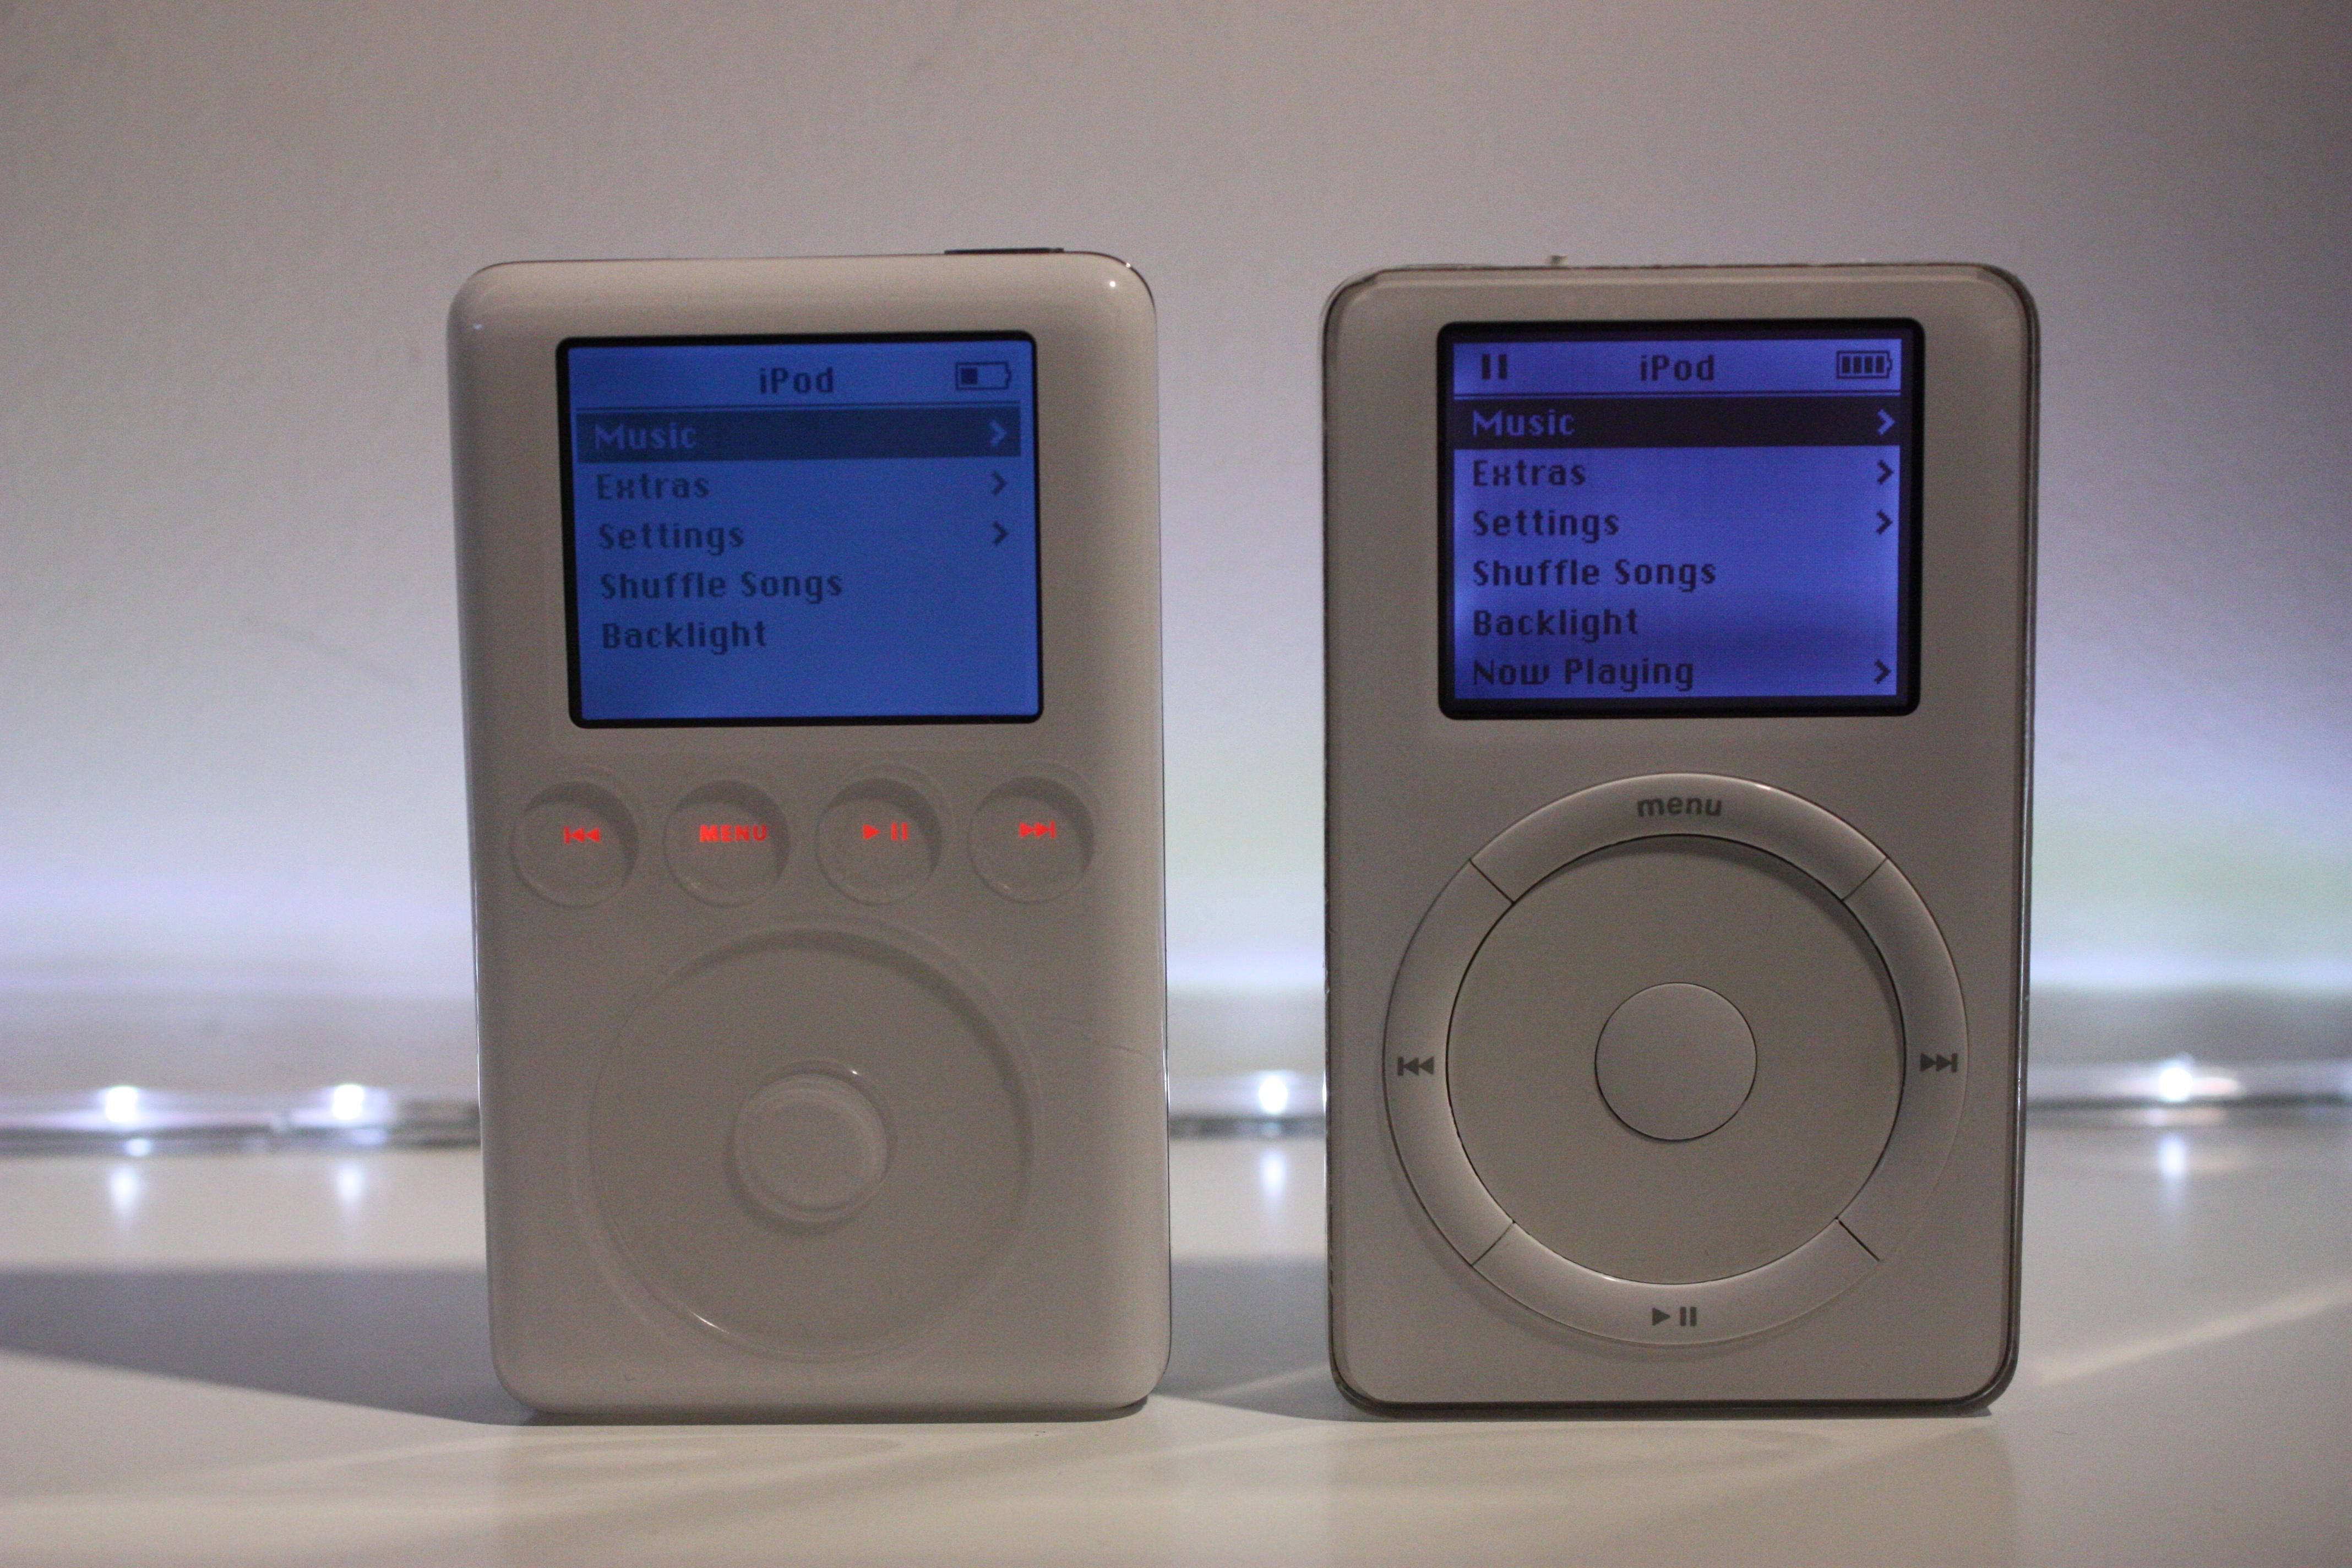 iPod 2nd Gen 10GB v iPod 3rd Gen 40GB | Flickr - Photo ...